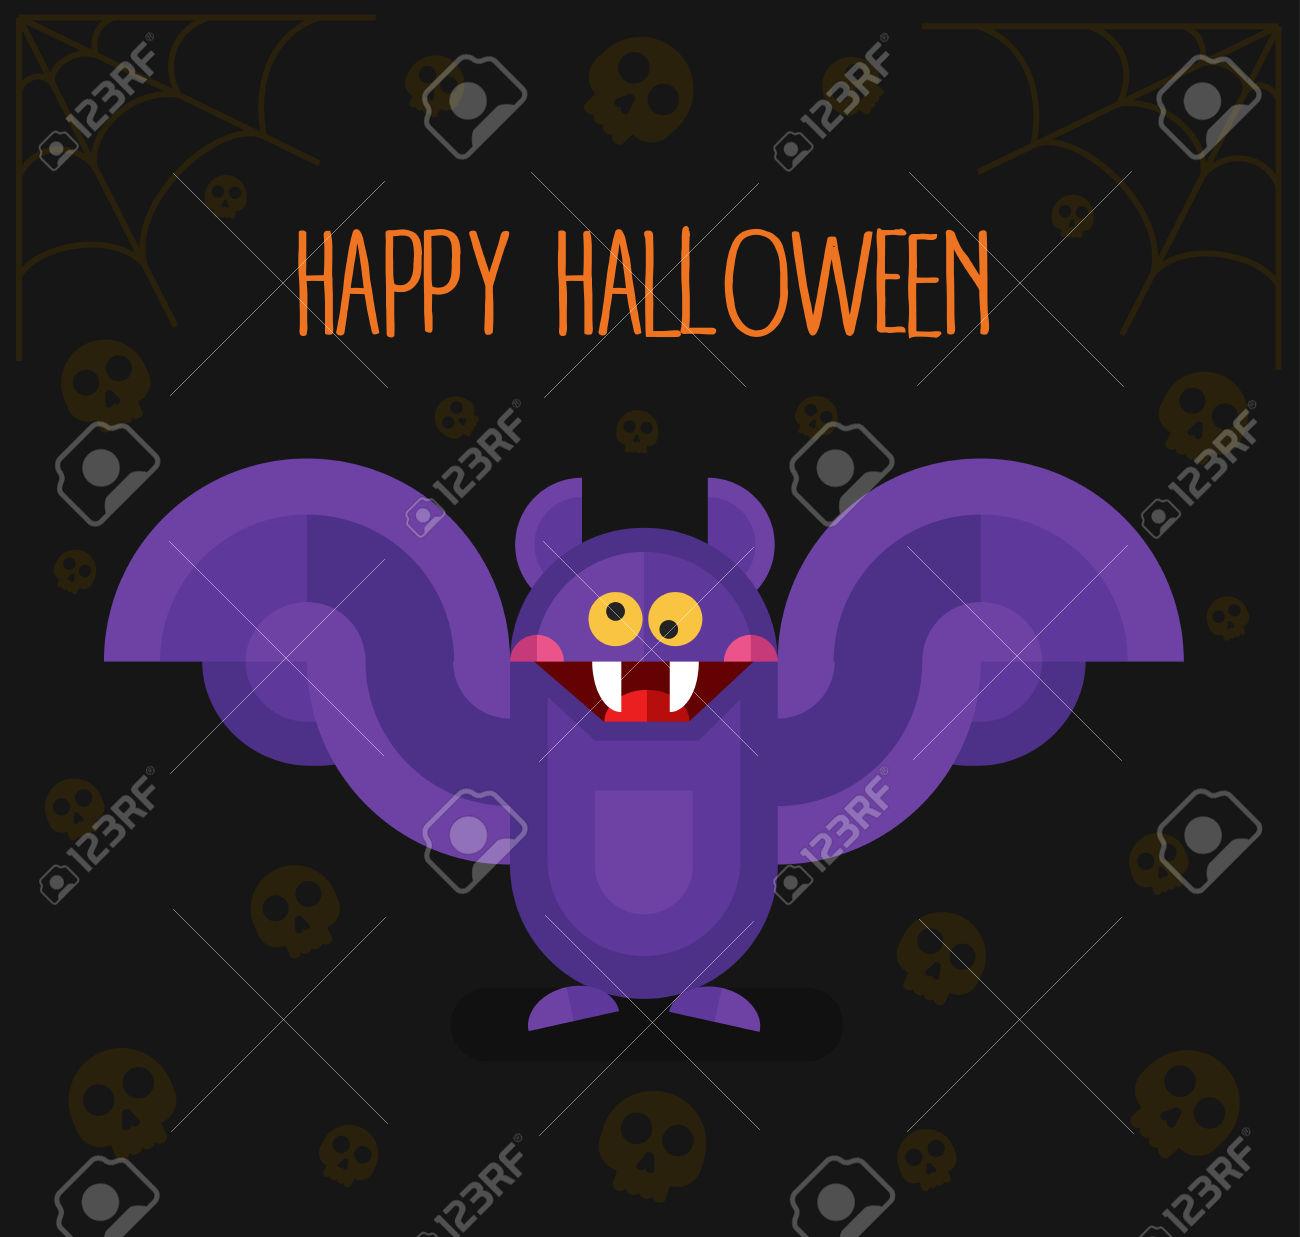 Flat Design Illustration With Cartoon Cute Scary Vampire Bat.